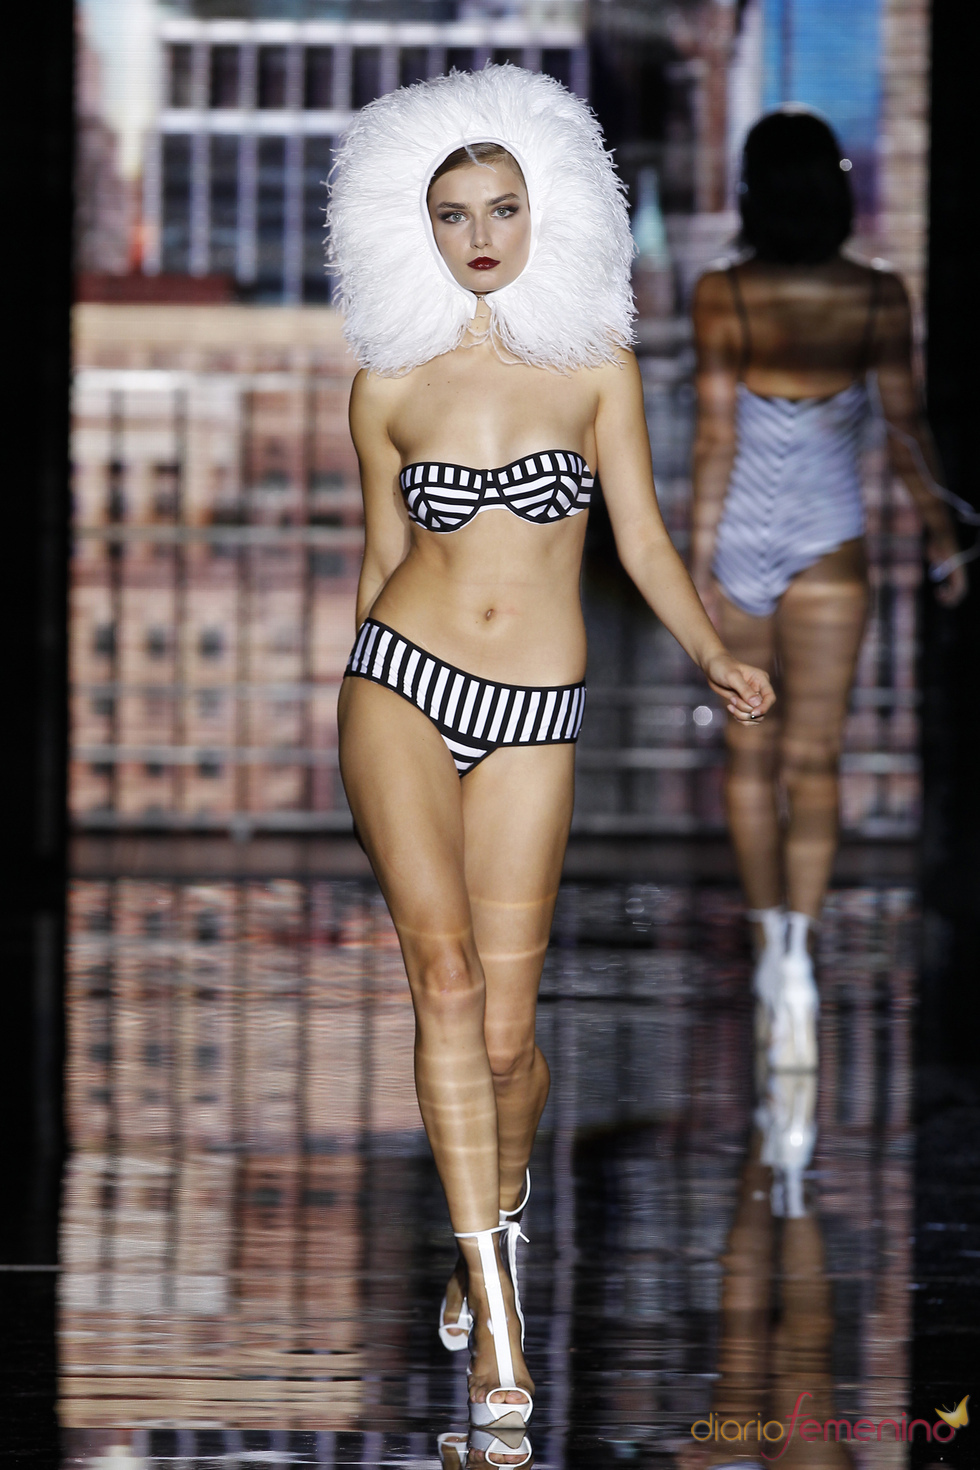 Verano 2011: Bikini de rayas de Andrés Sardá